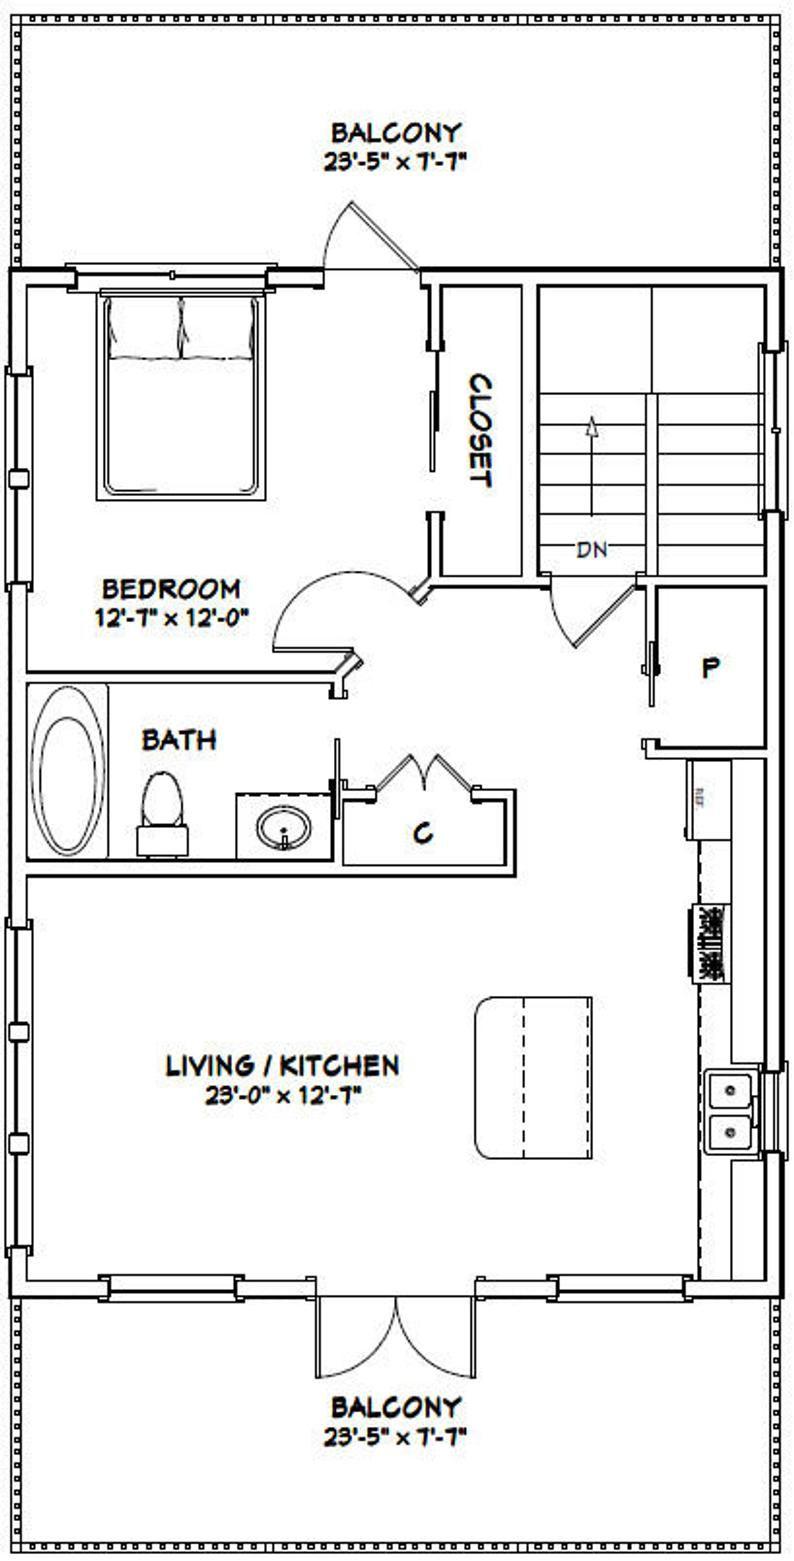 24x32 House 1 Bedroom 1.5 Bath 830 sq ft PDF